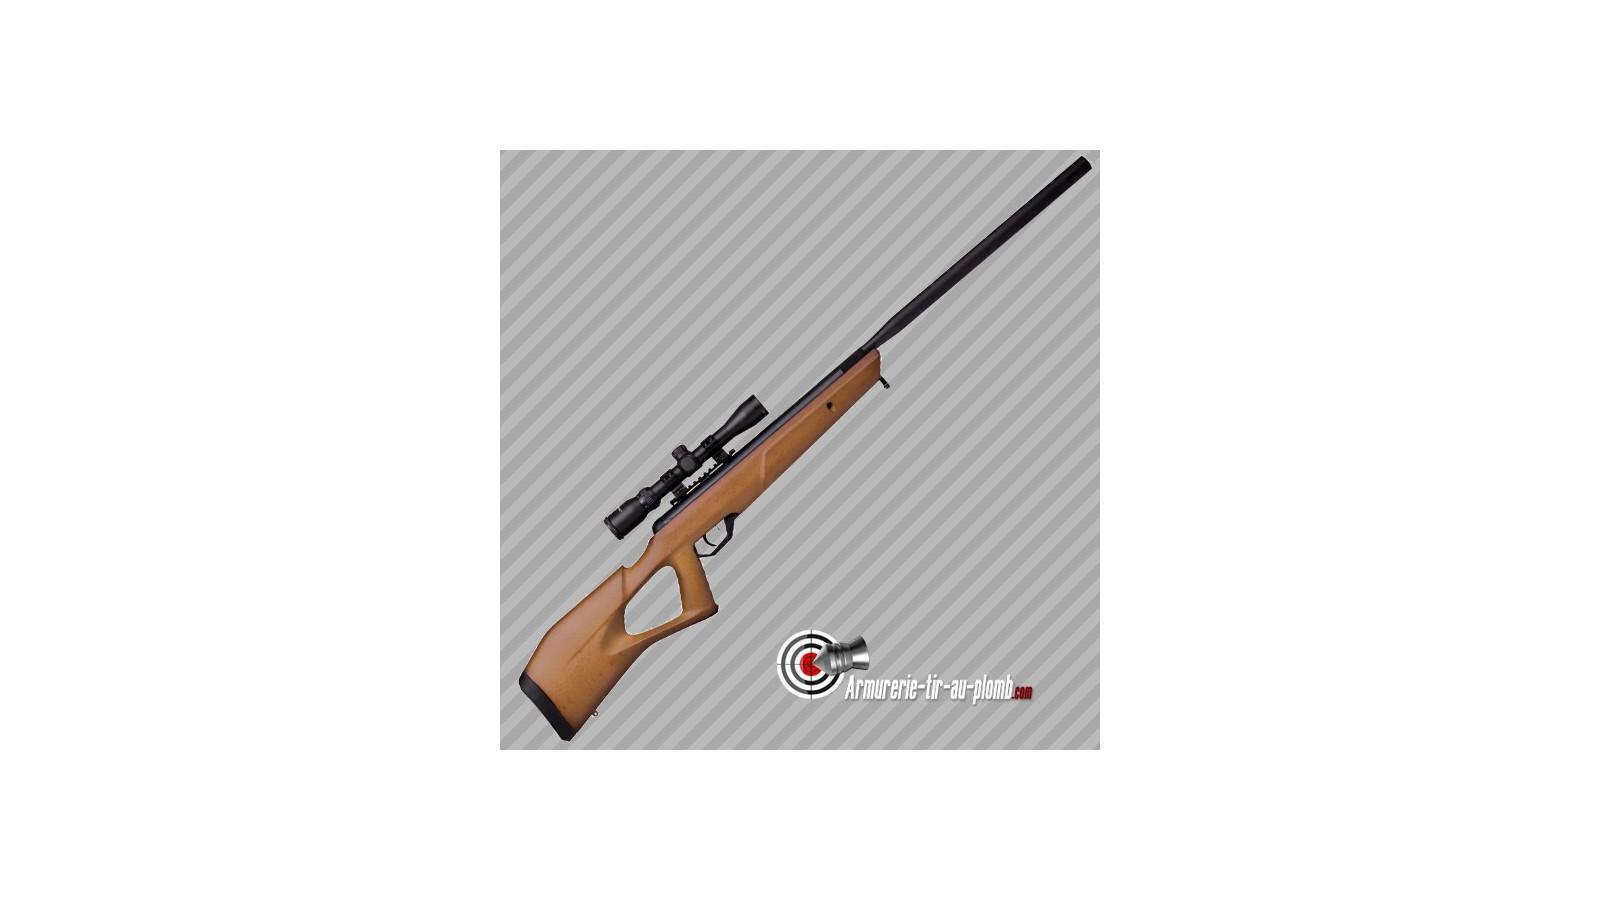 Carabine à plombs Benjamin trail Nitro Piston 2 cal 5 5mm